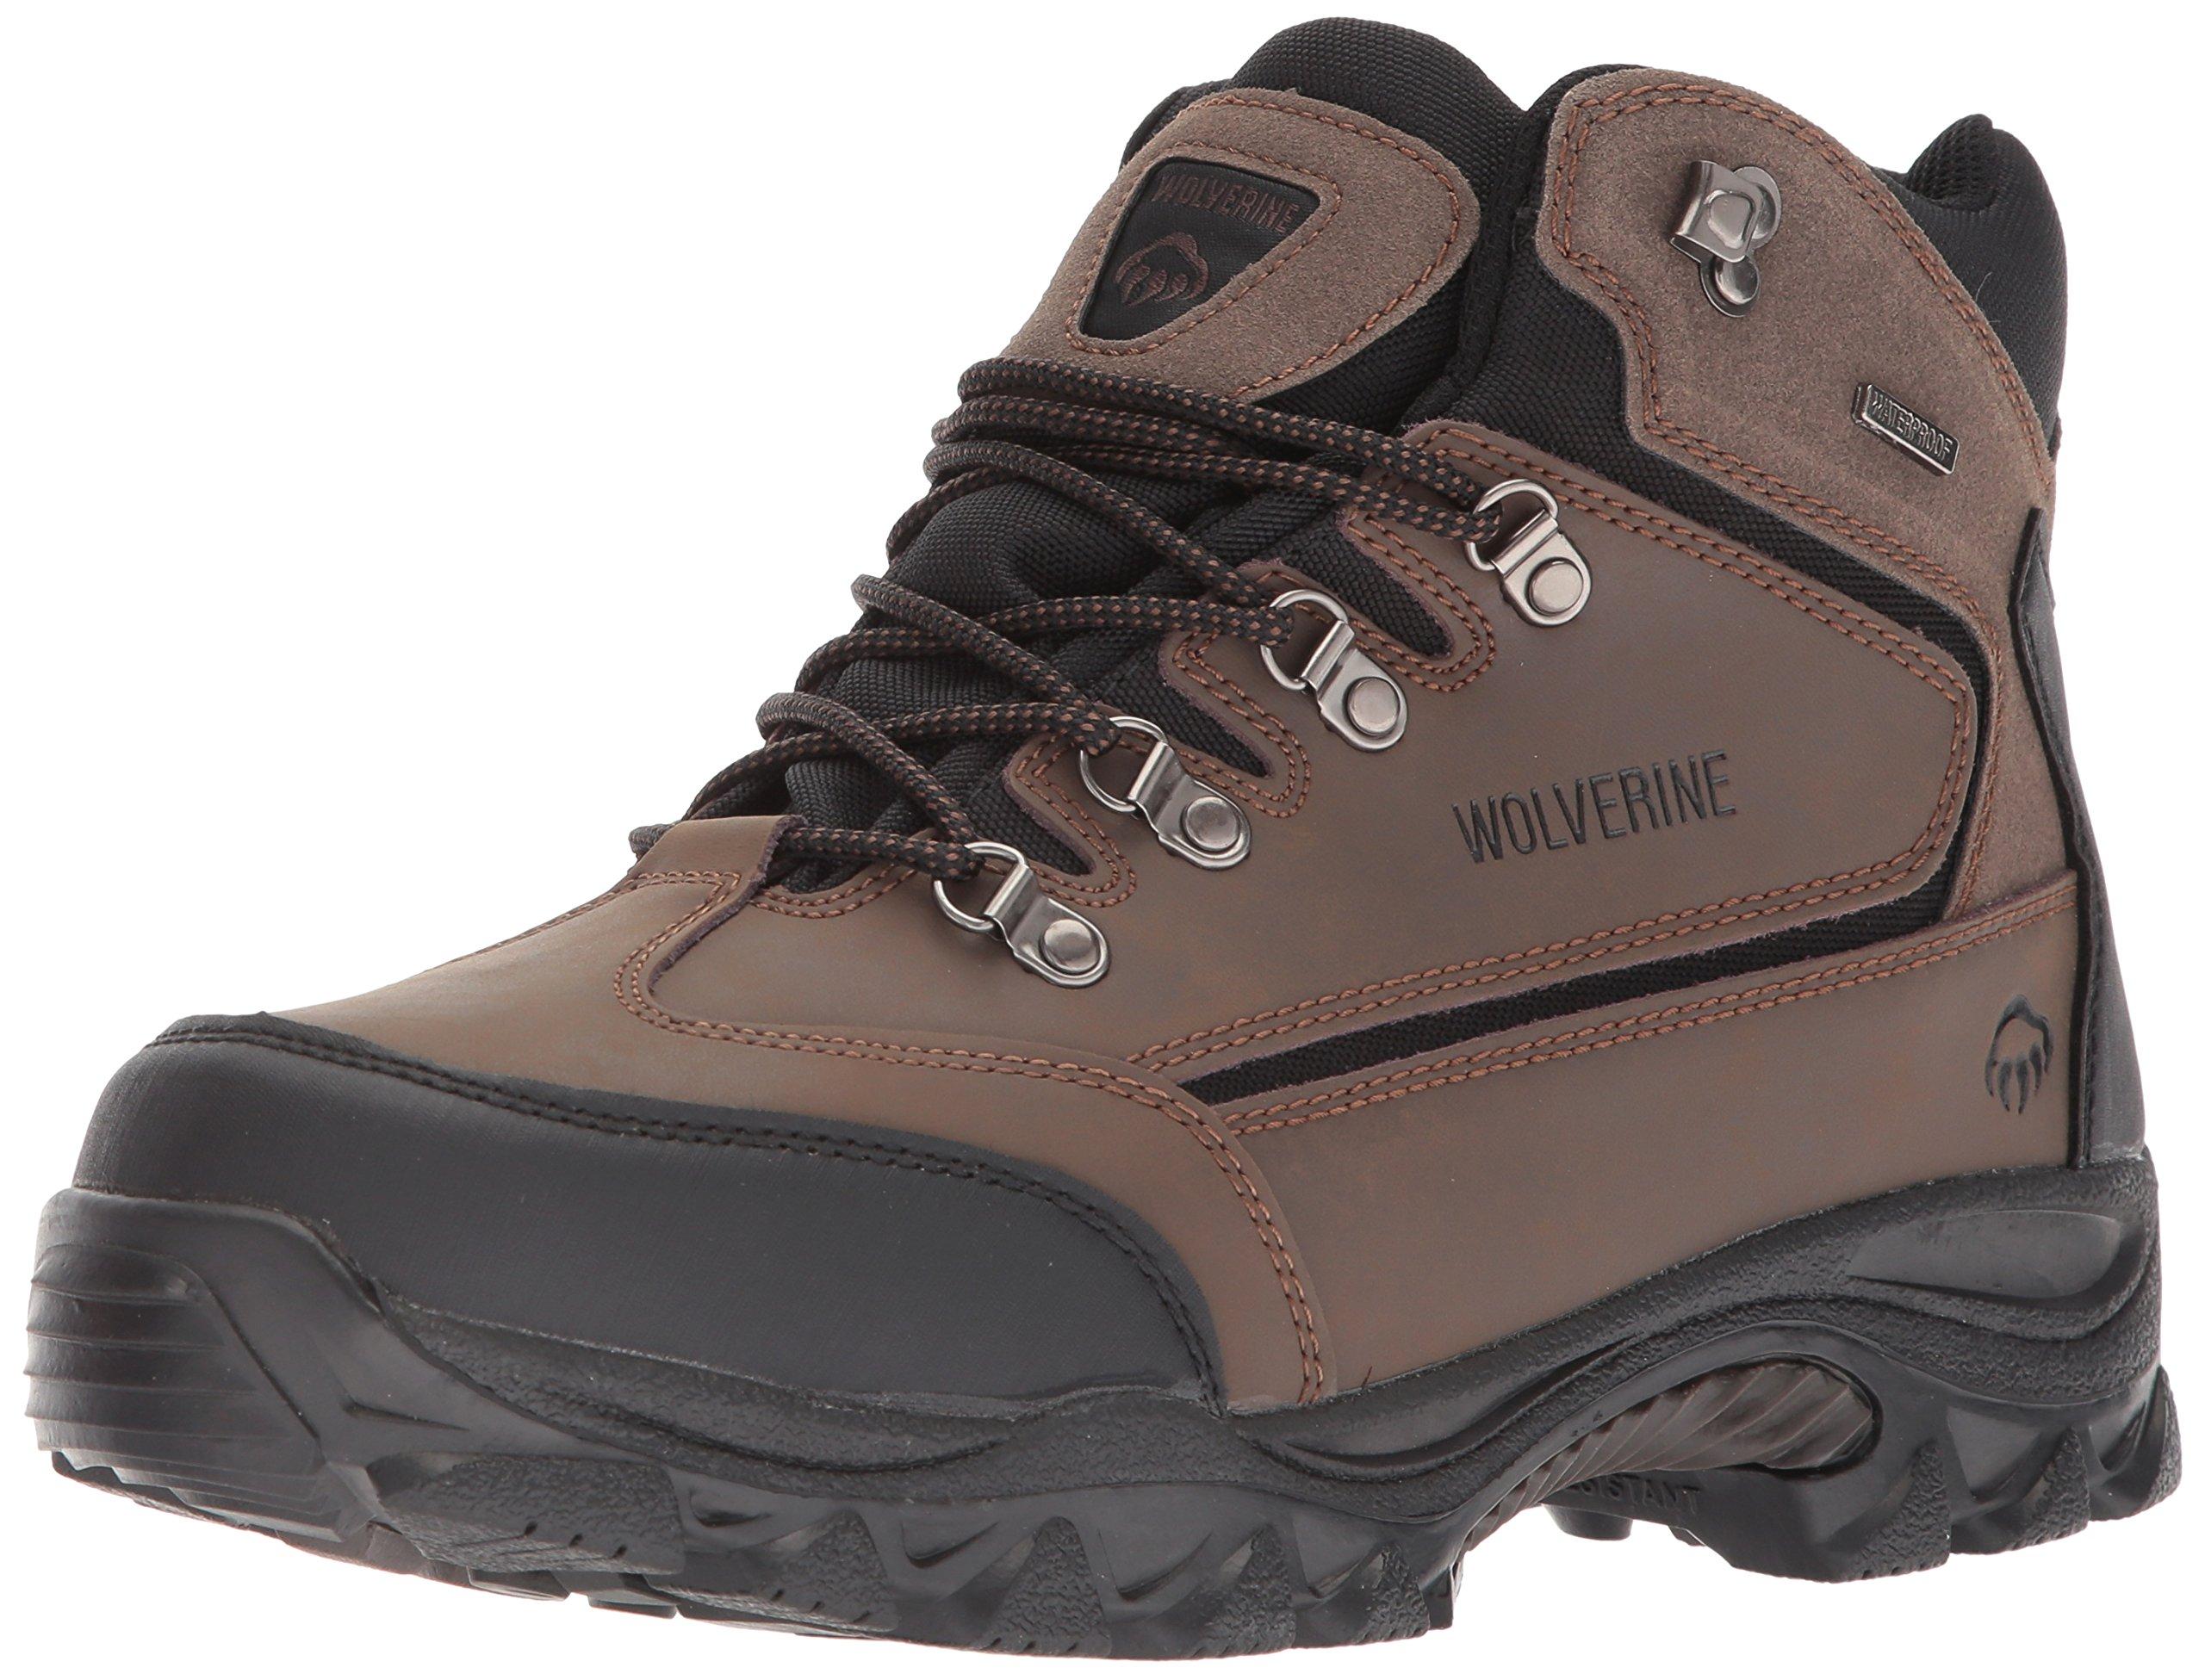 Wolverine Men's W05103 Spencer Boot, Brown/Black,9.5 M